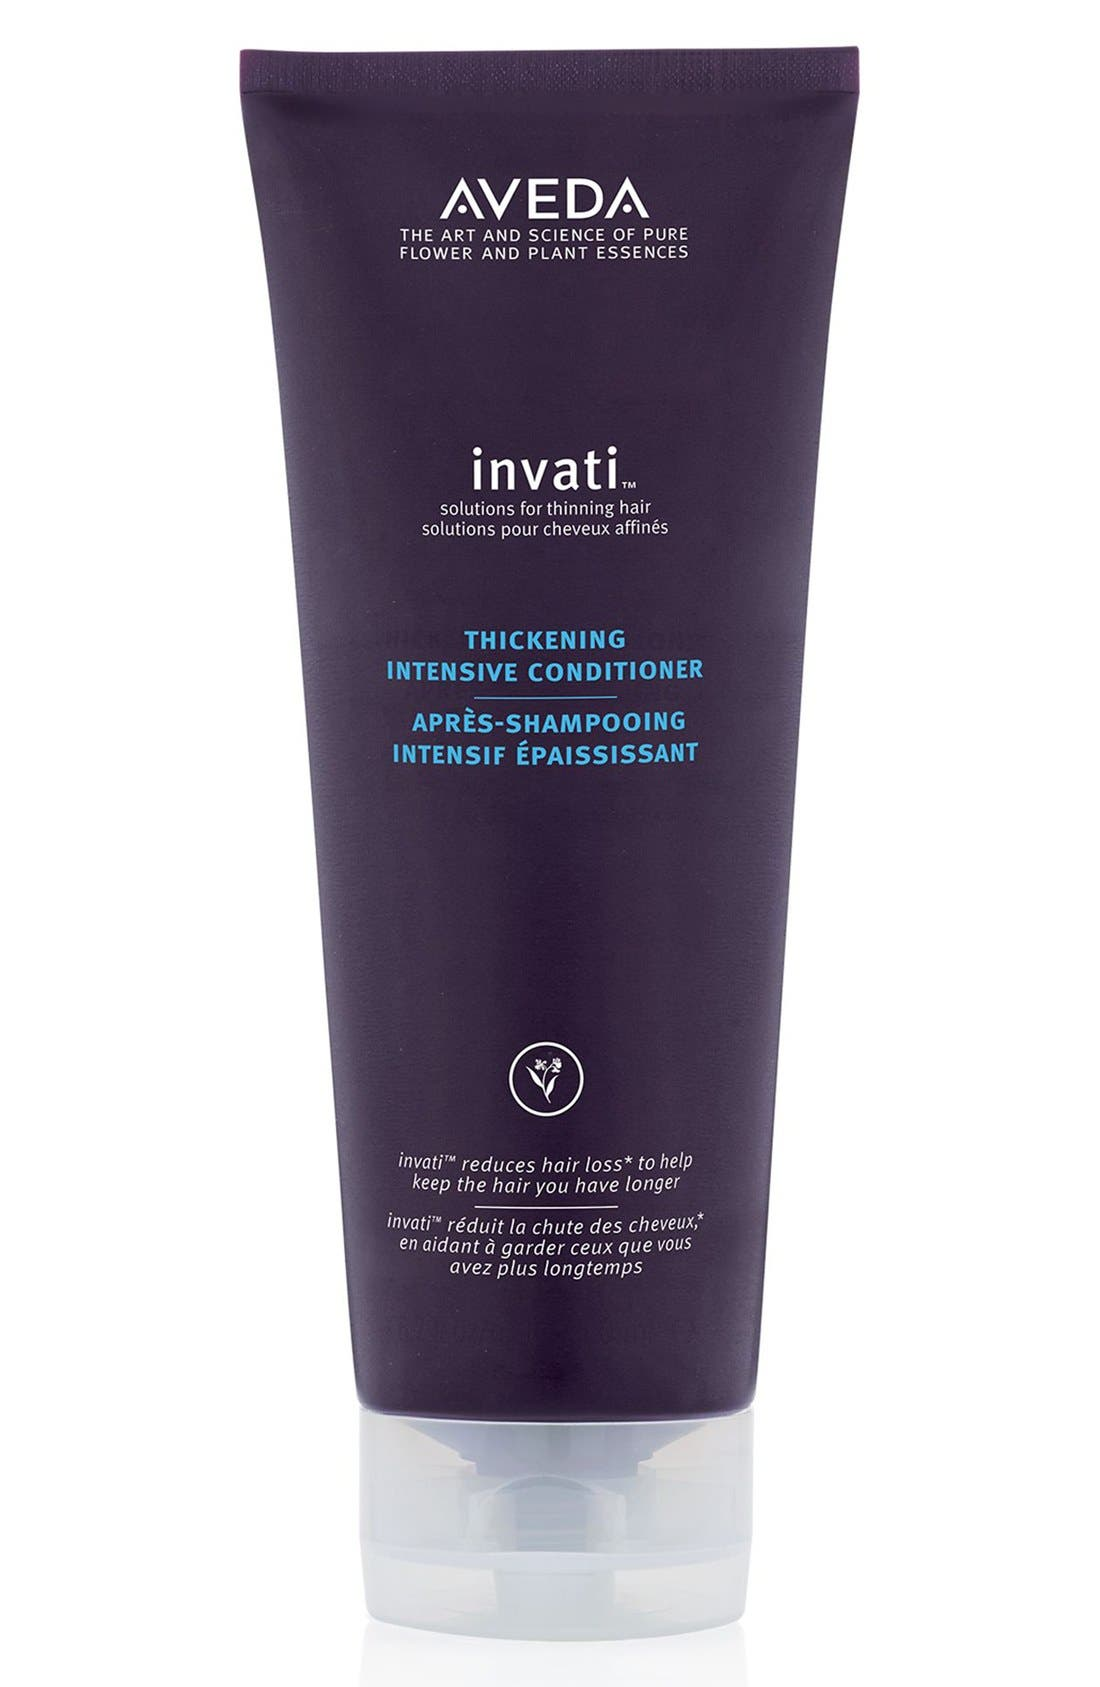 Aveda 'invati™' Thickening Intensive Conditioner